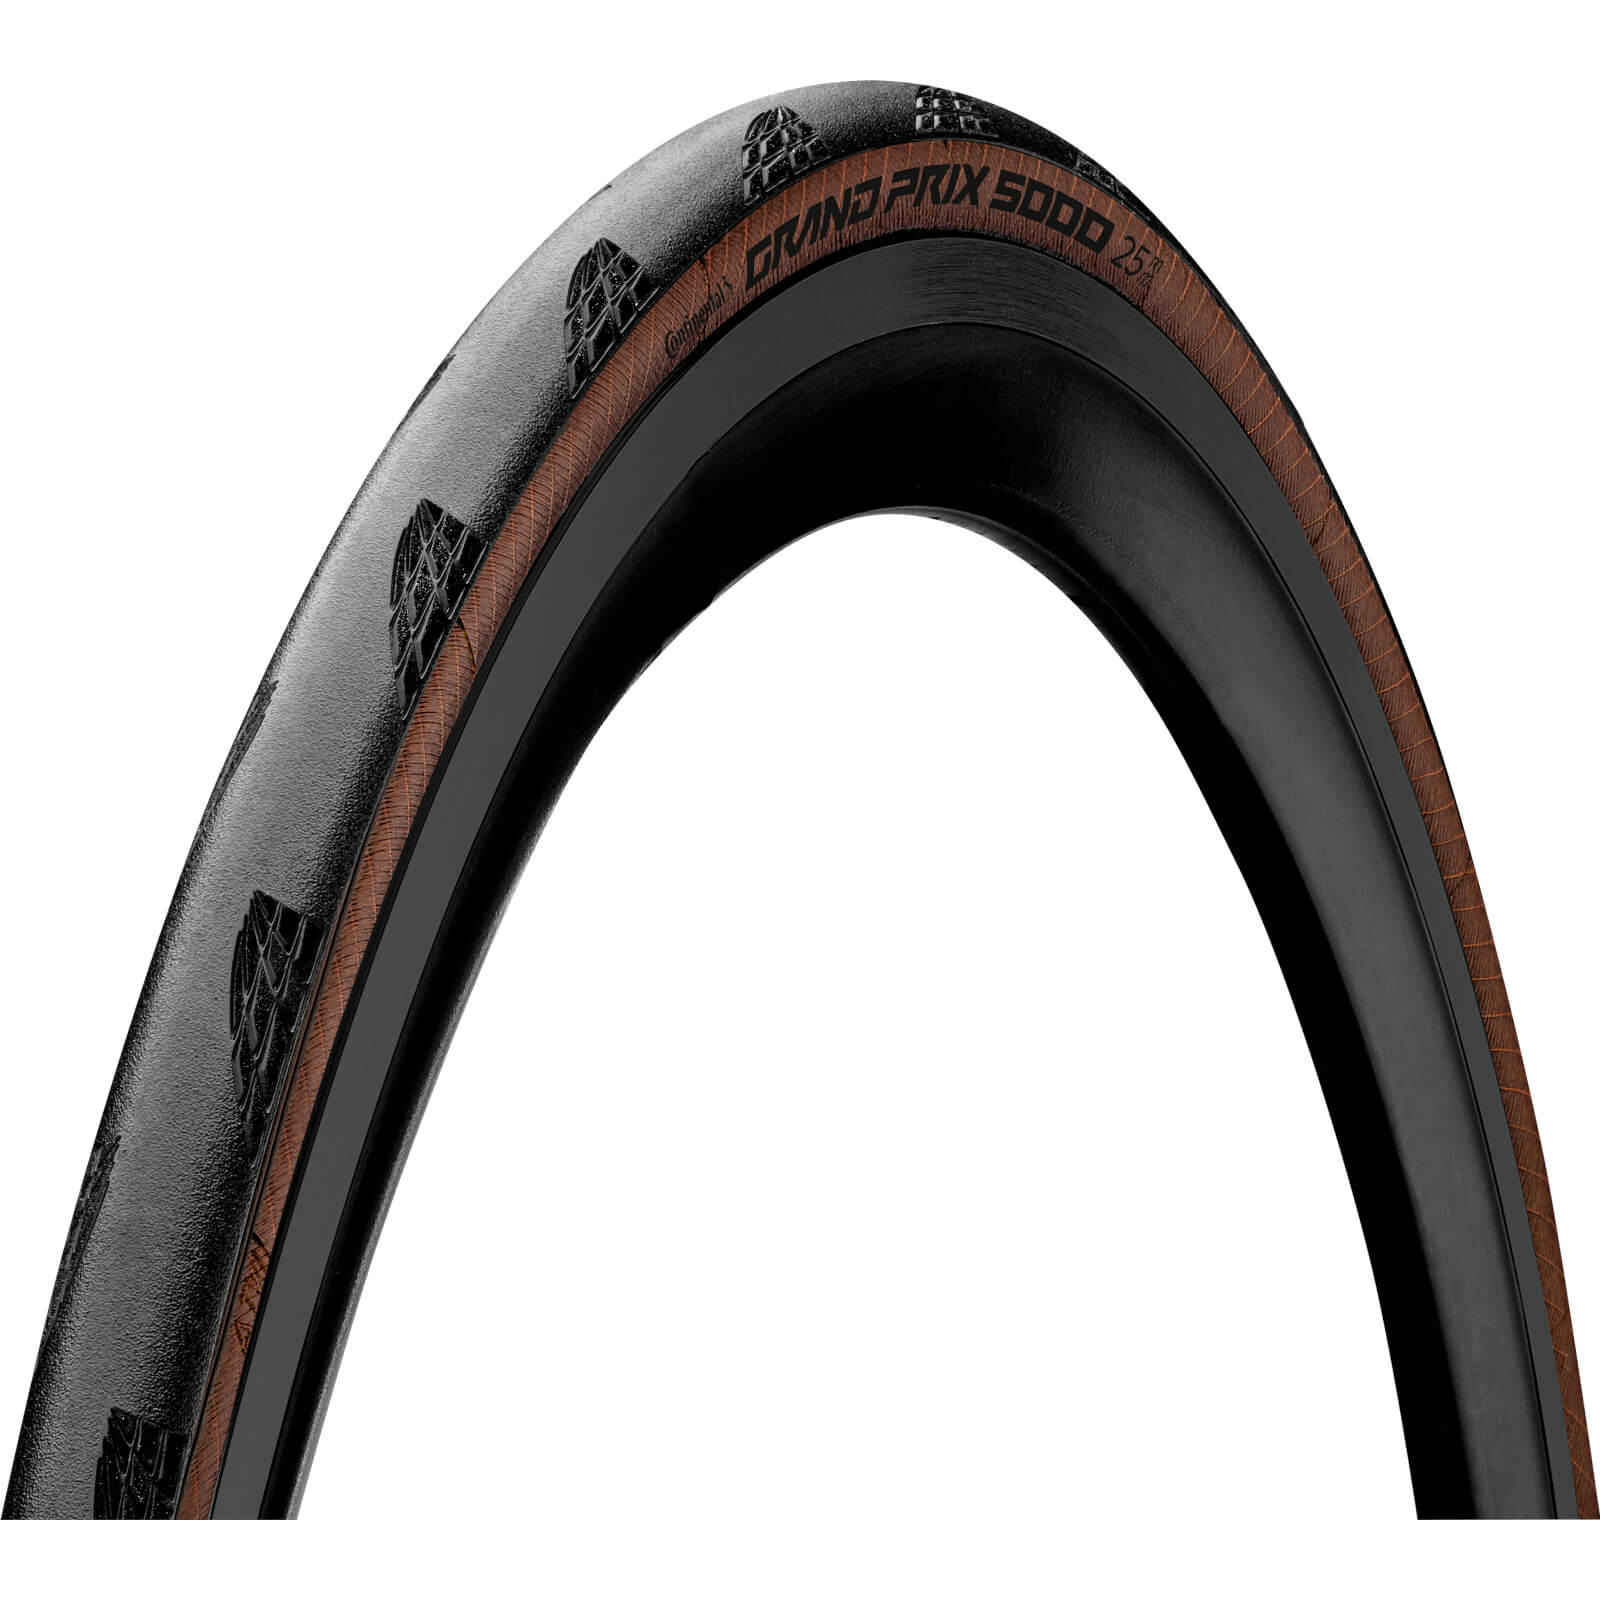 Continental Grand Prix 5000 Clincher Road Tyre – Transparent - 25mm